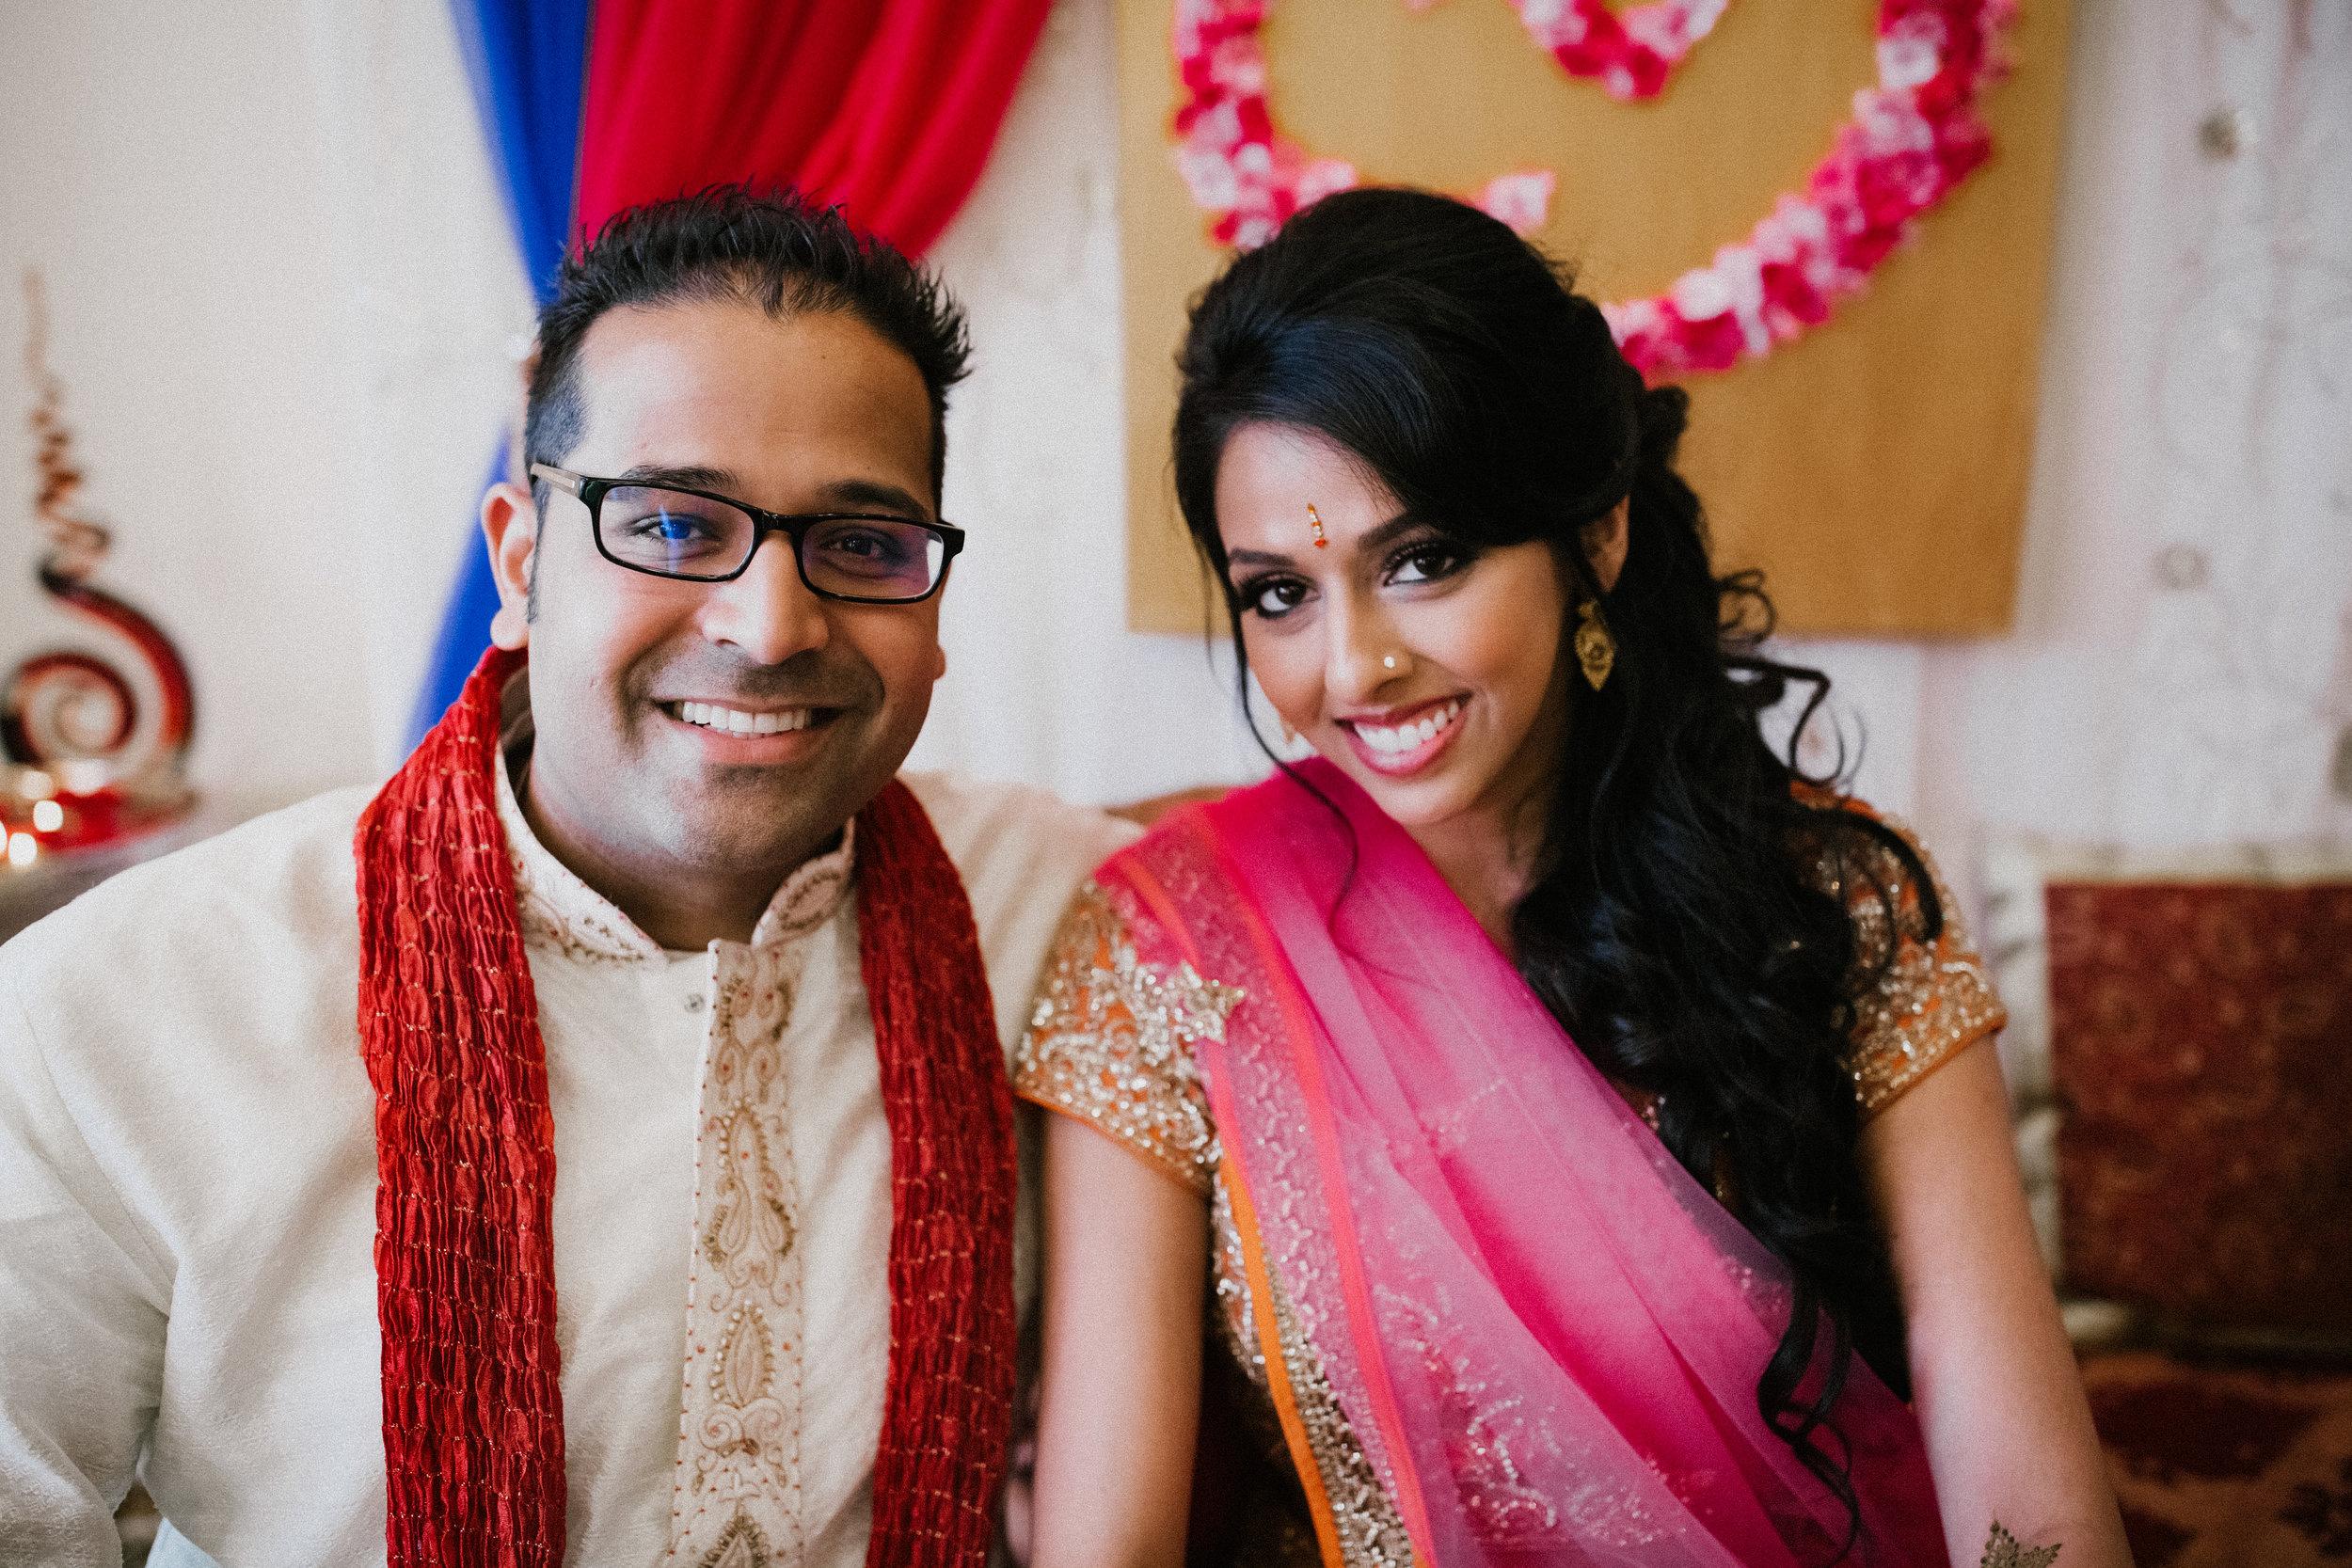 Aparna-Ankit-Patel-Mehndi-Wedding-Photos-0065.jpg